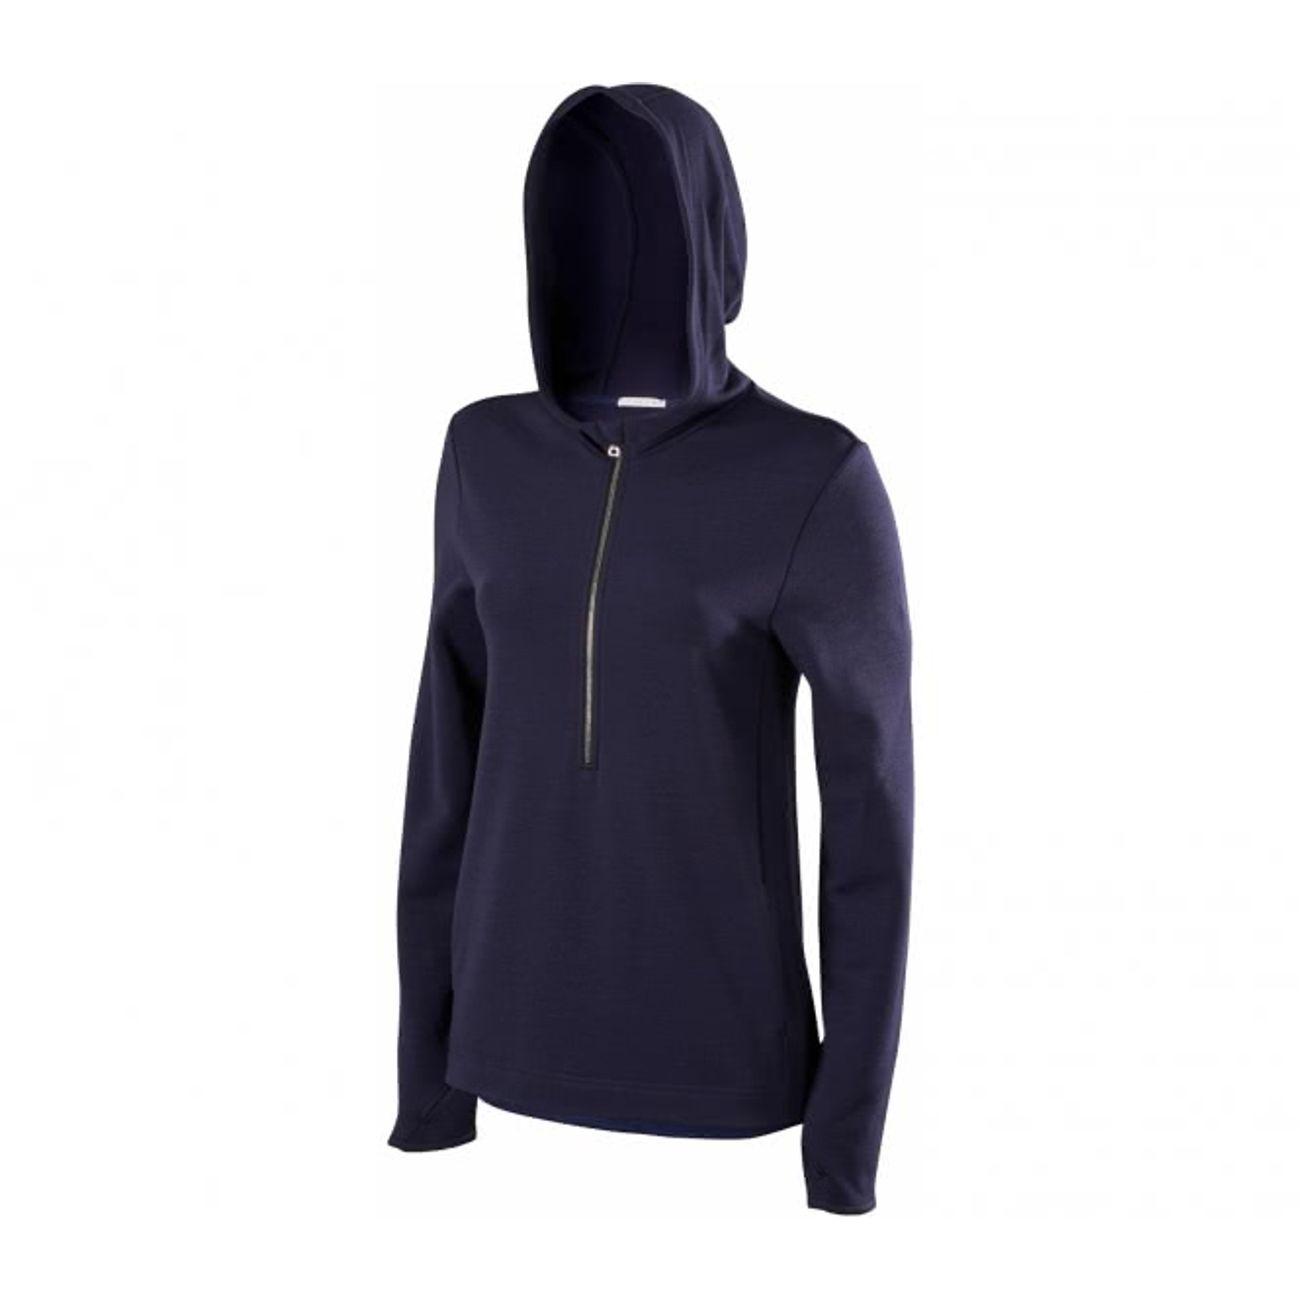 daa4a5f42aea1 running femme FALKE Falke - Fashion Manche longue Hooded Femmes sweat- chemise (bleu foncé